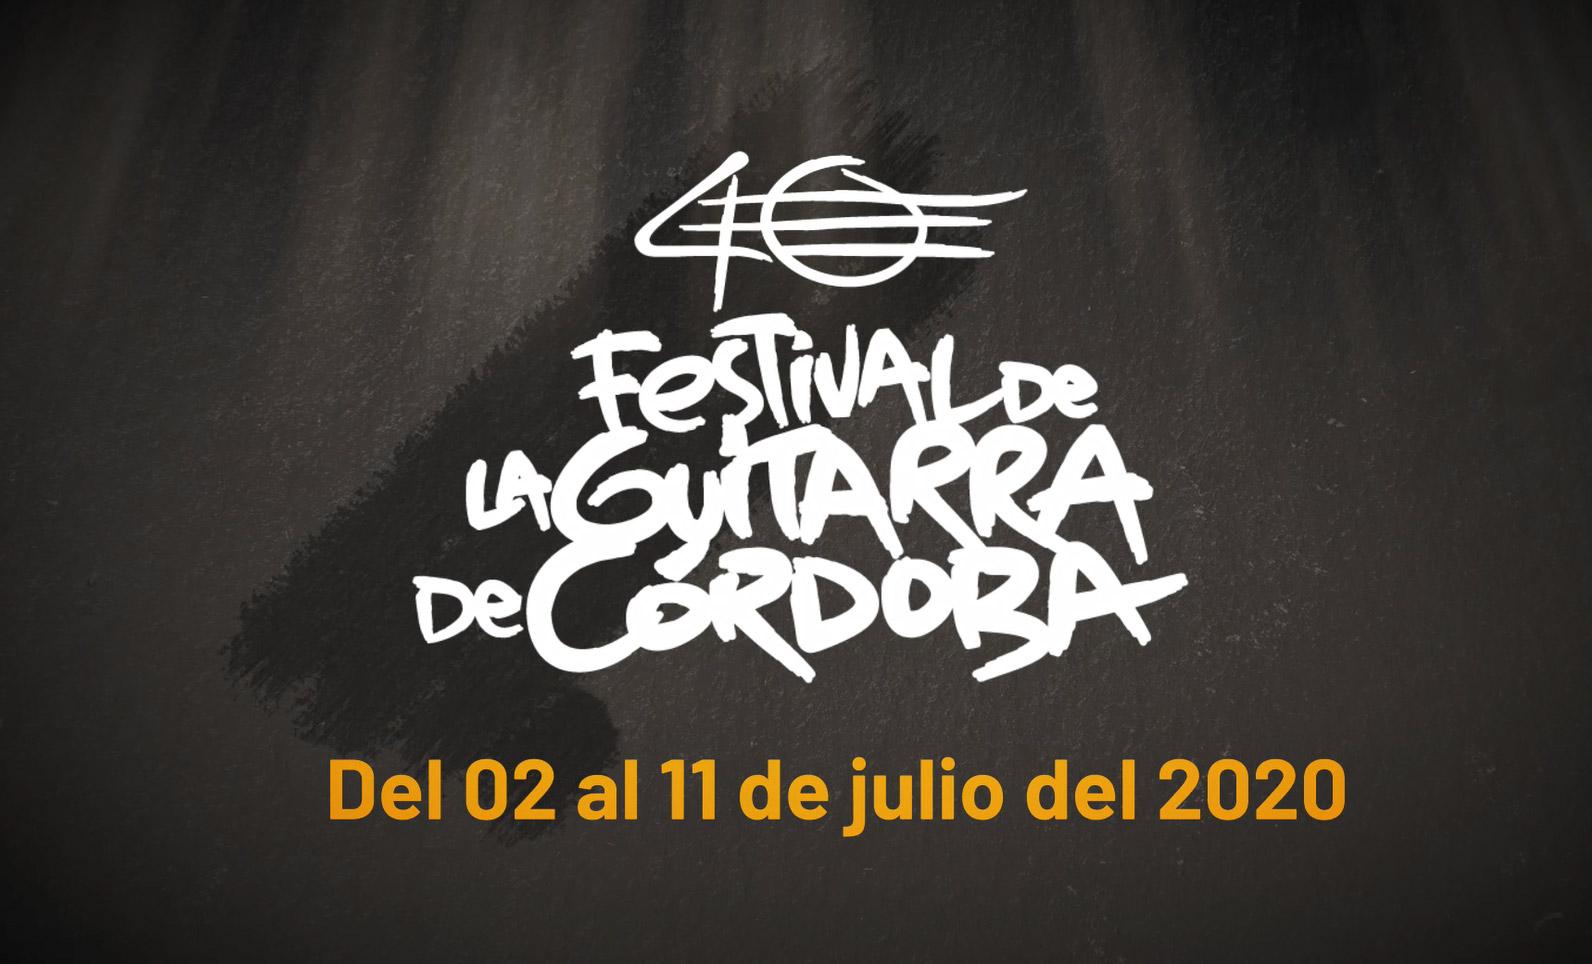 Motion graphics - Festival de la Guitarra